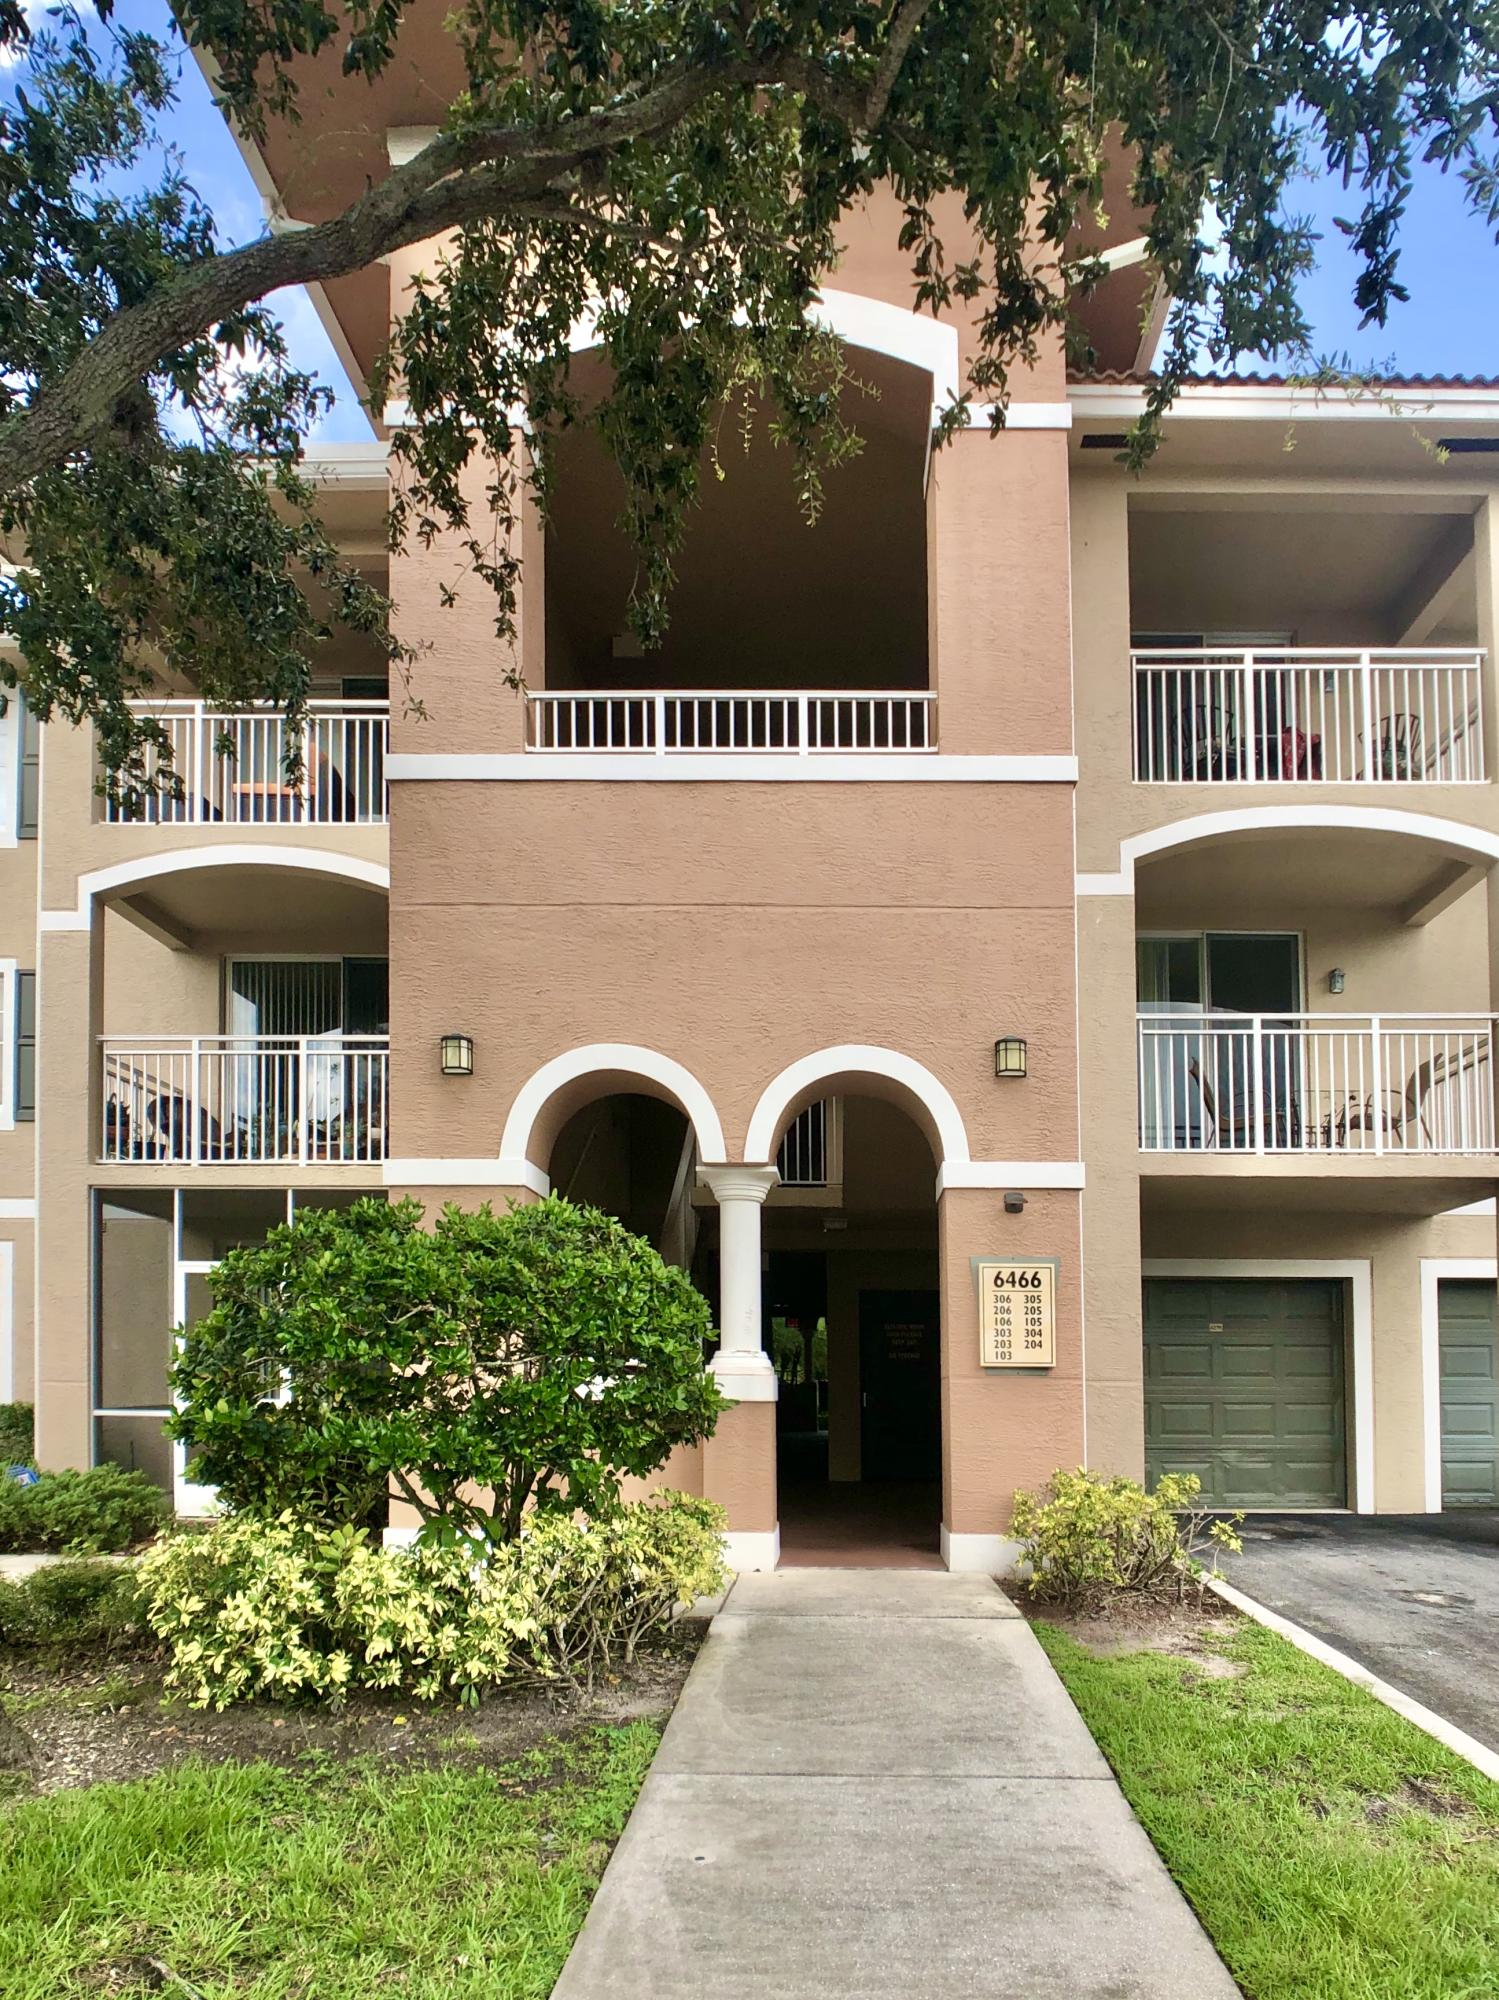 6466 Emerald Dunes Drive #303 - 33411 - FL - West Palm Beach